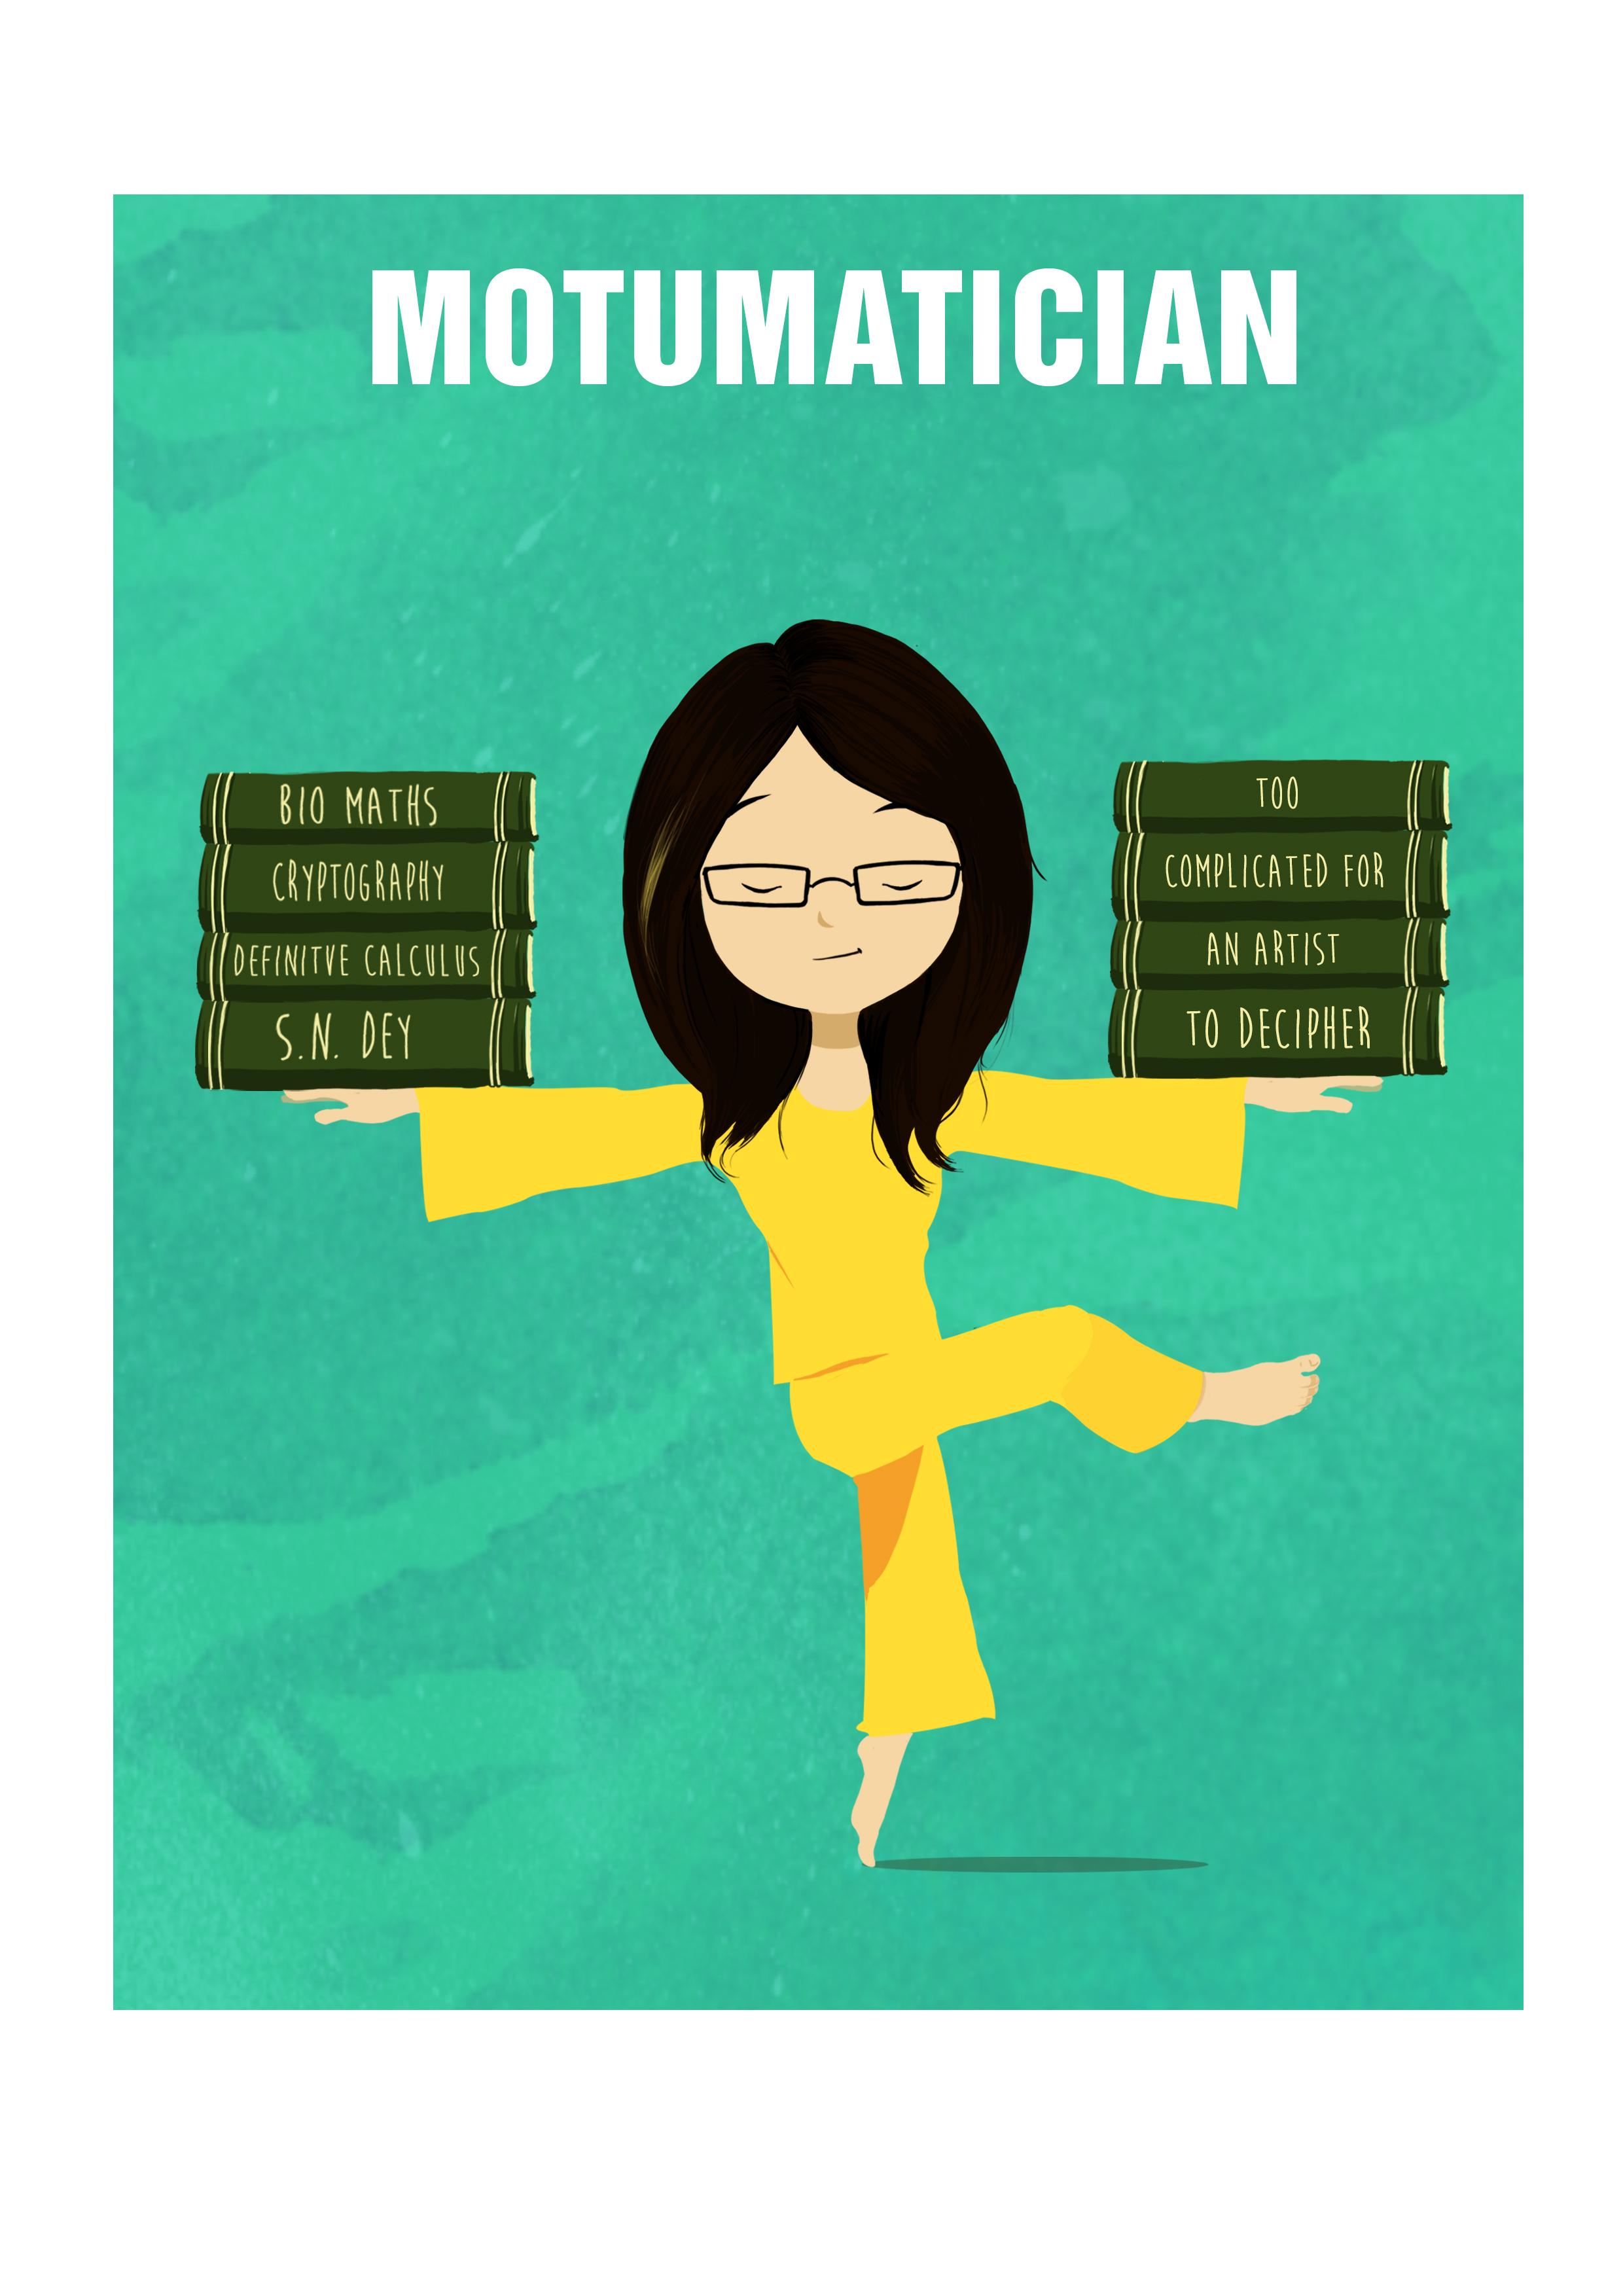 Motumatician